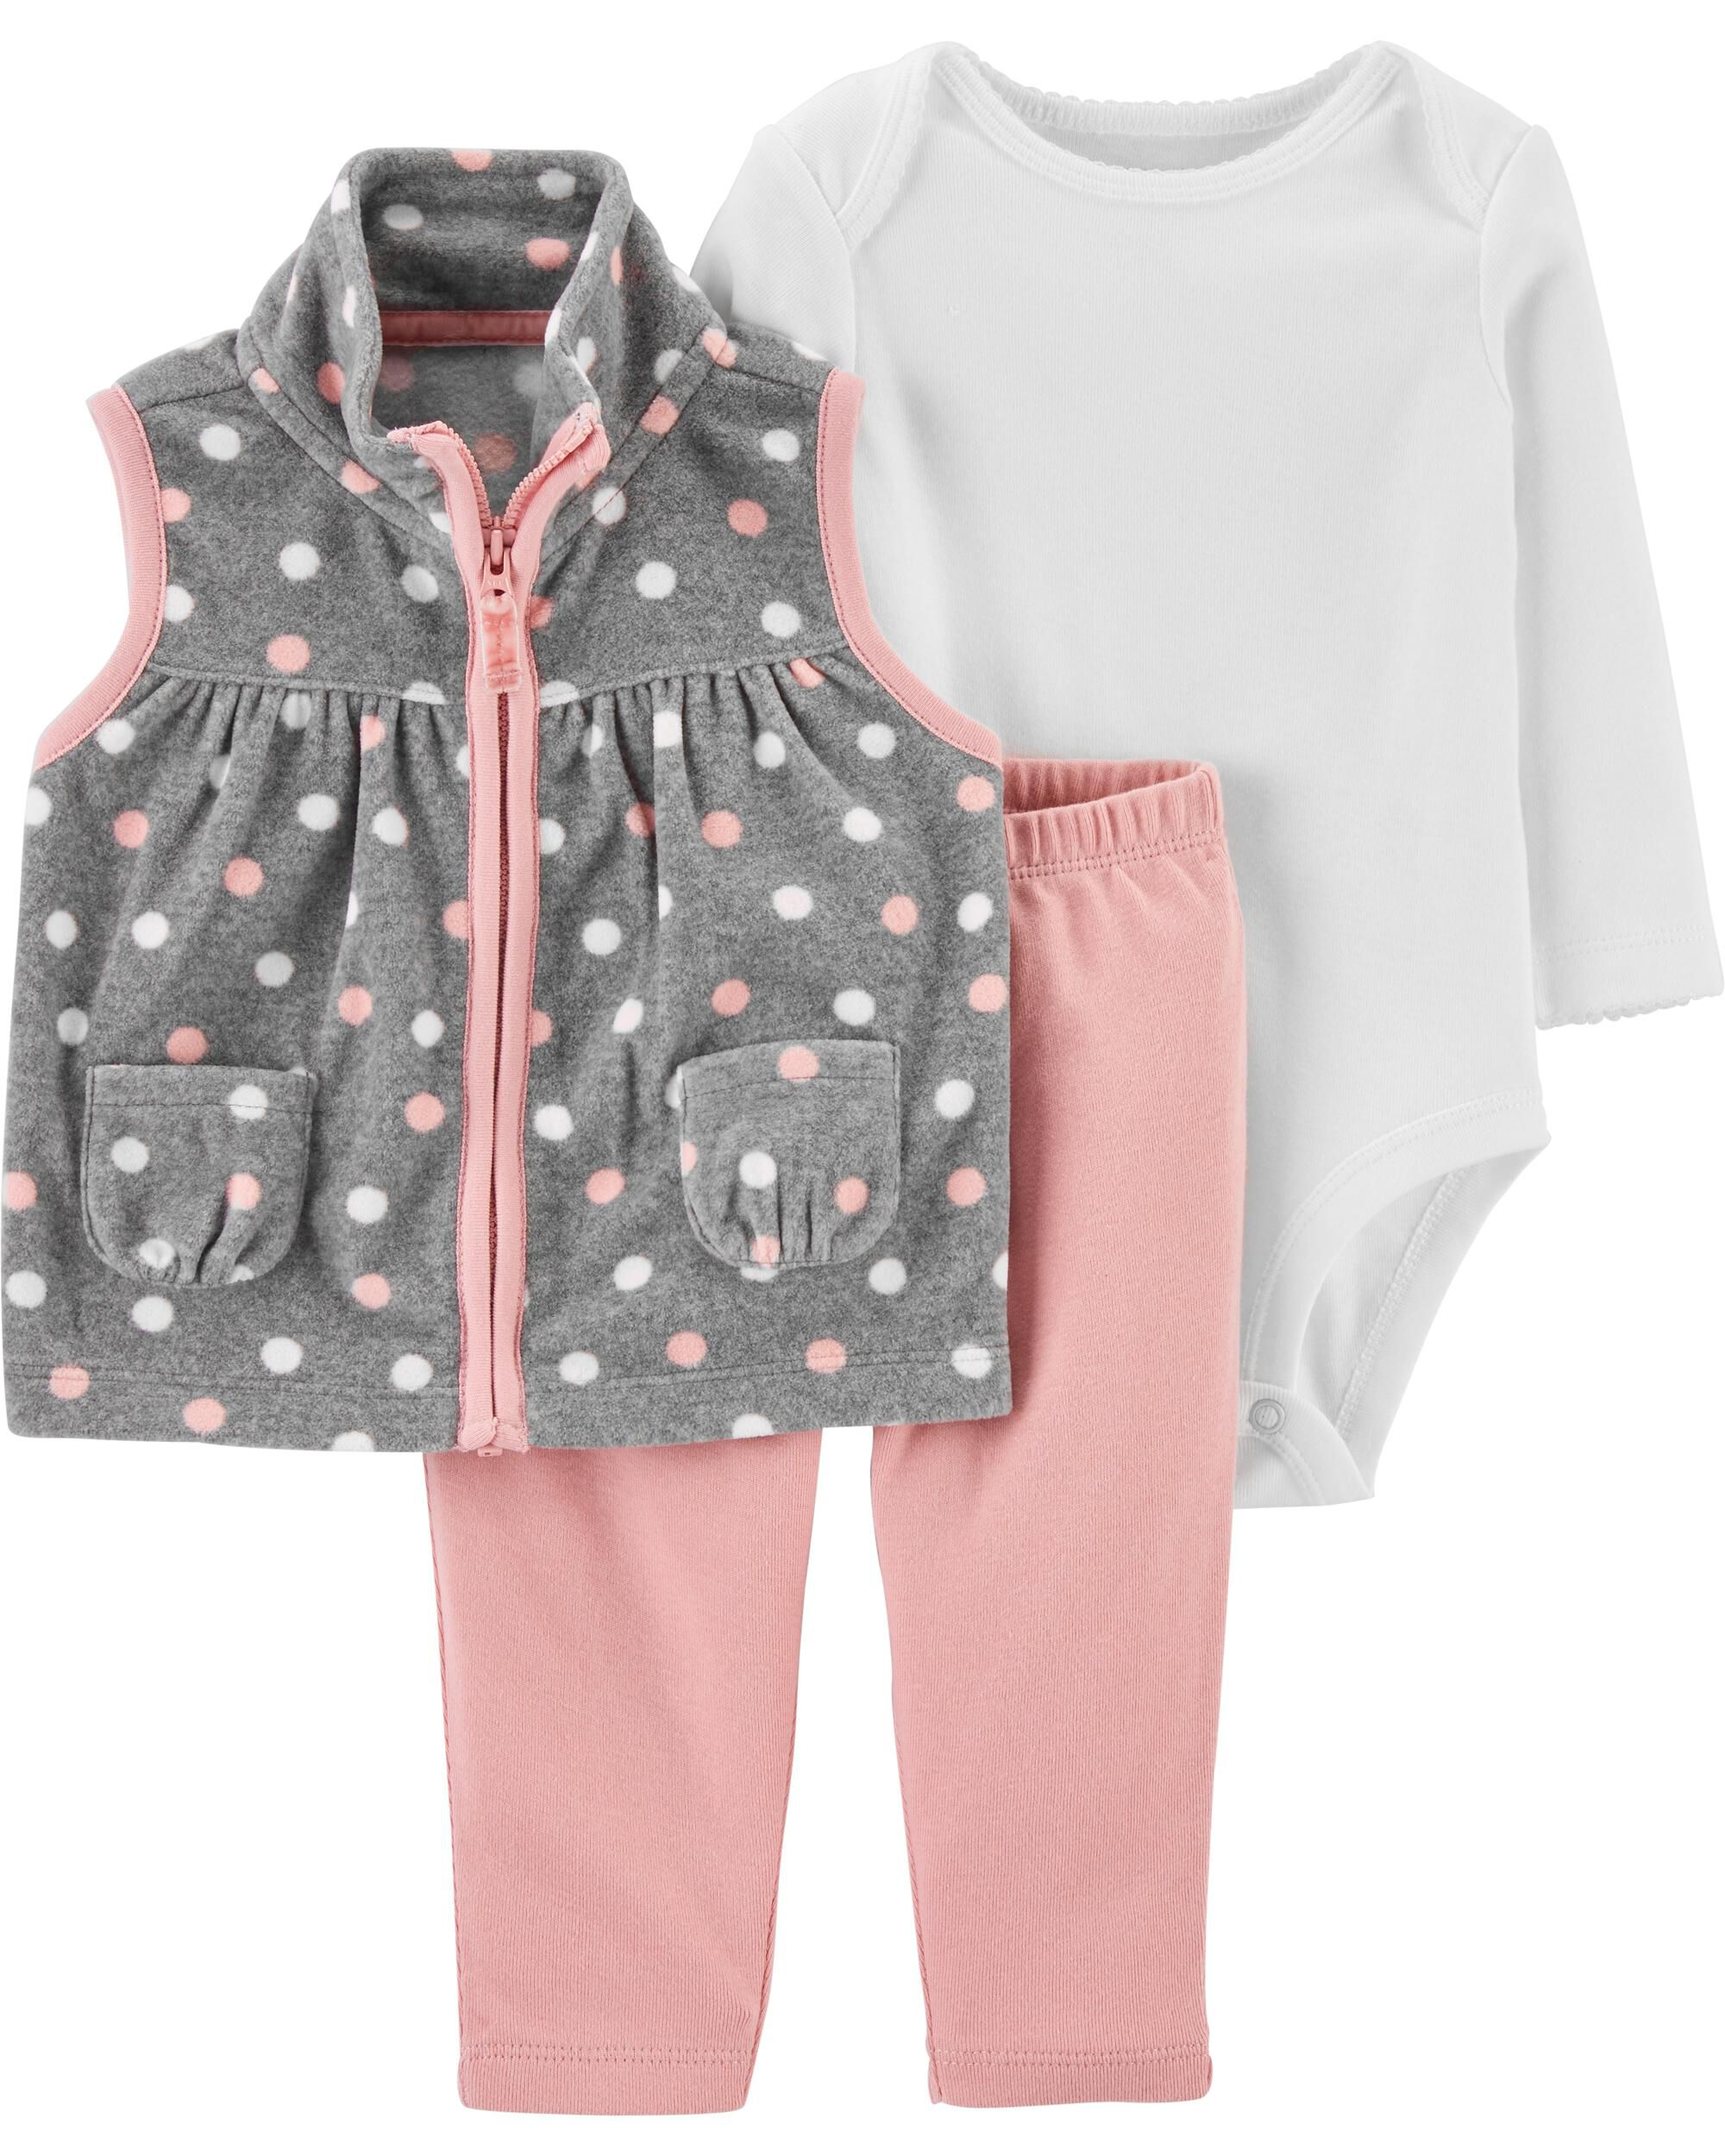 *CLEARANCE* 3-Piece Polka Dot Little Vest Set